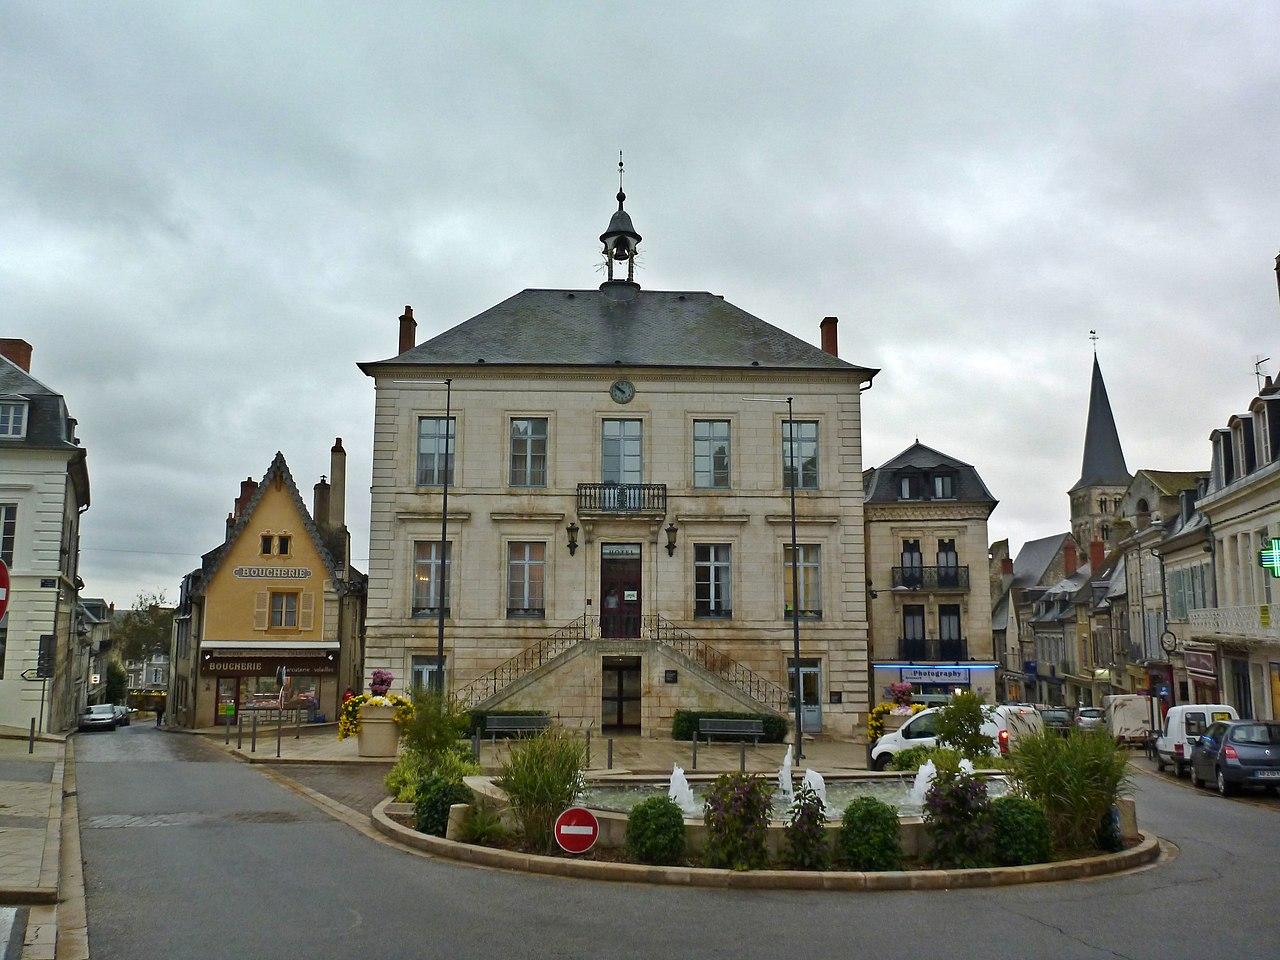 File:Hotel de ville La Charité-sur-Loire.JPG - Wikimedia ...